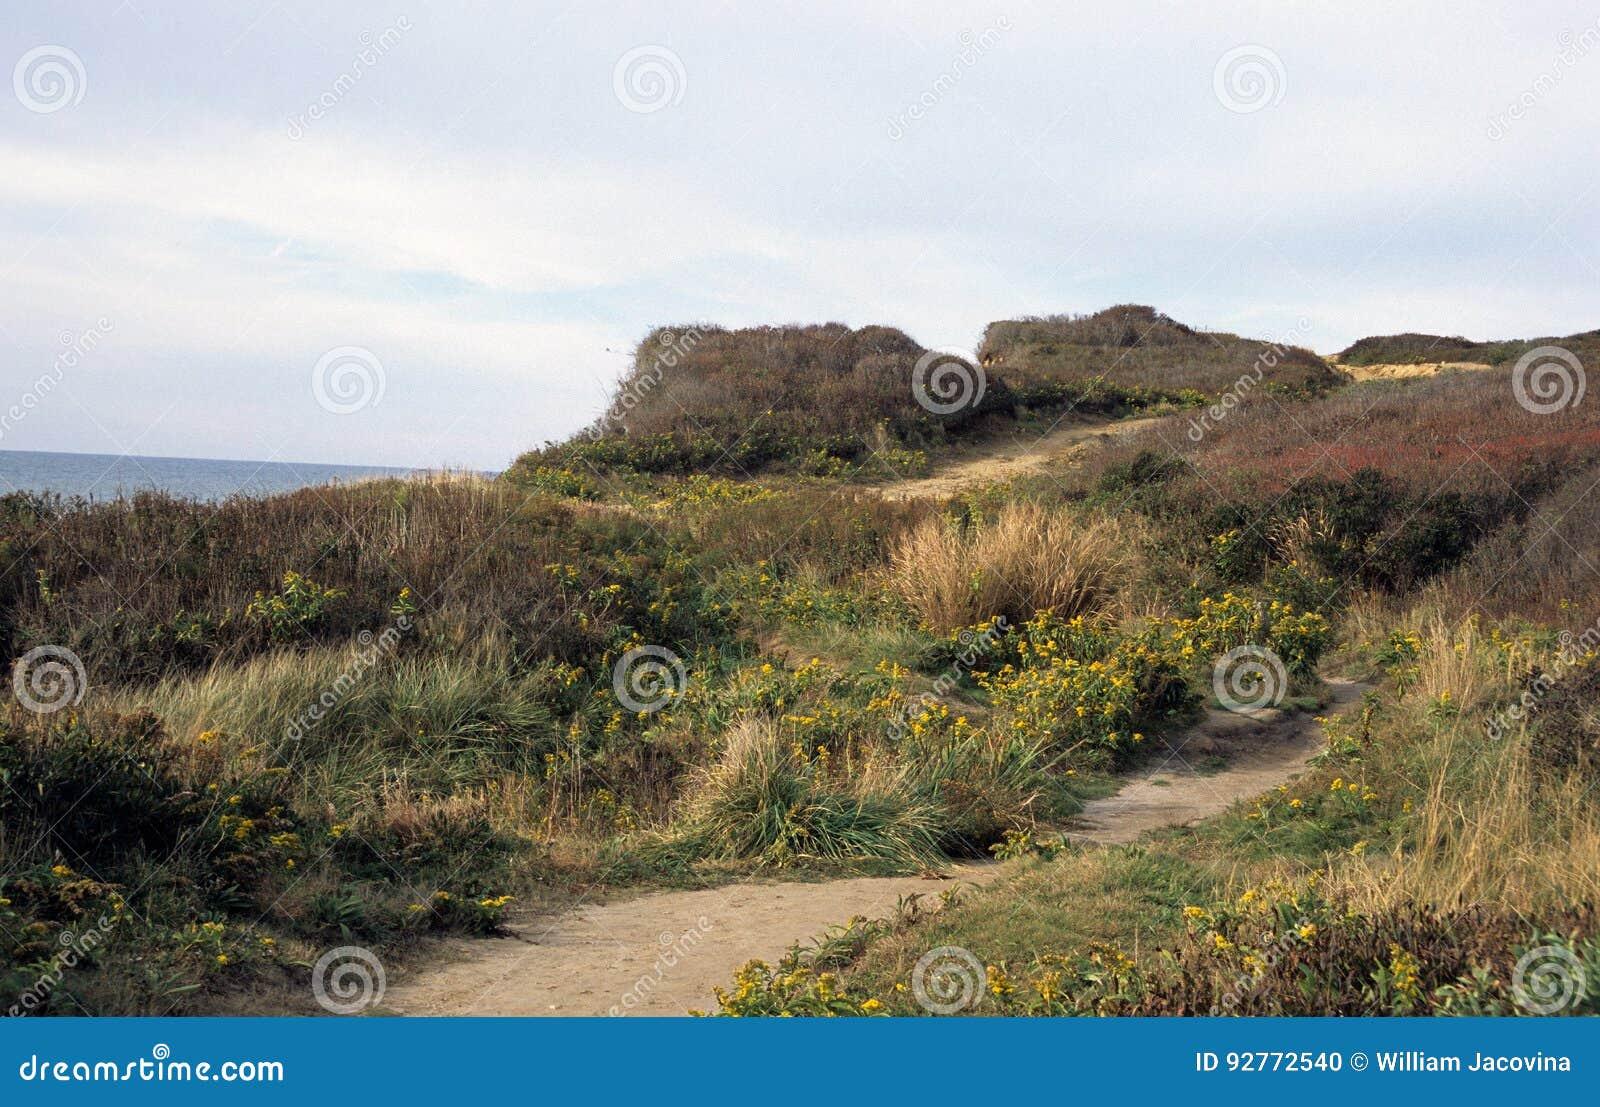 Ocean Bluff Trail